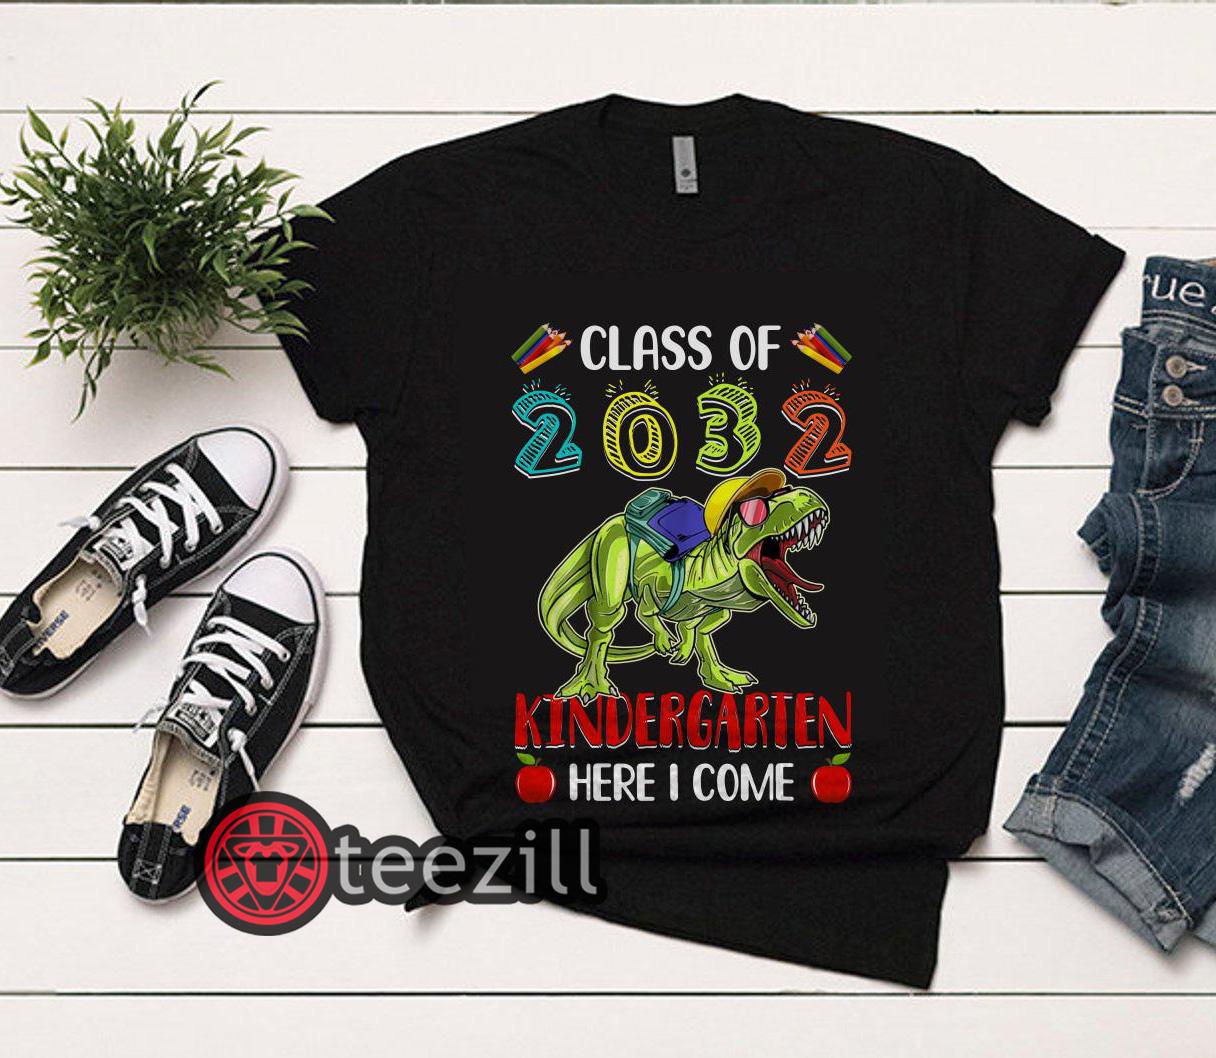 Clickbuypro Unisex Tshirt Son Boy Kid T-rex Kindergarten Here I Come Class Of 2032 T-shirt Sweater Blue M